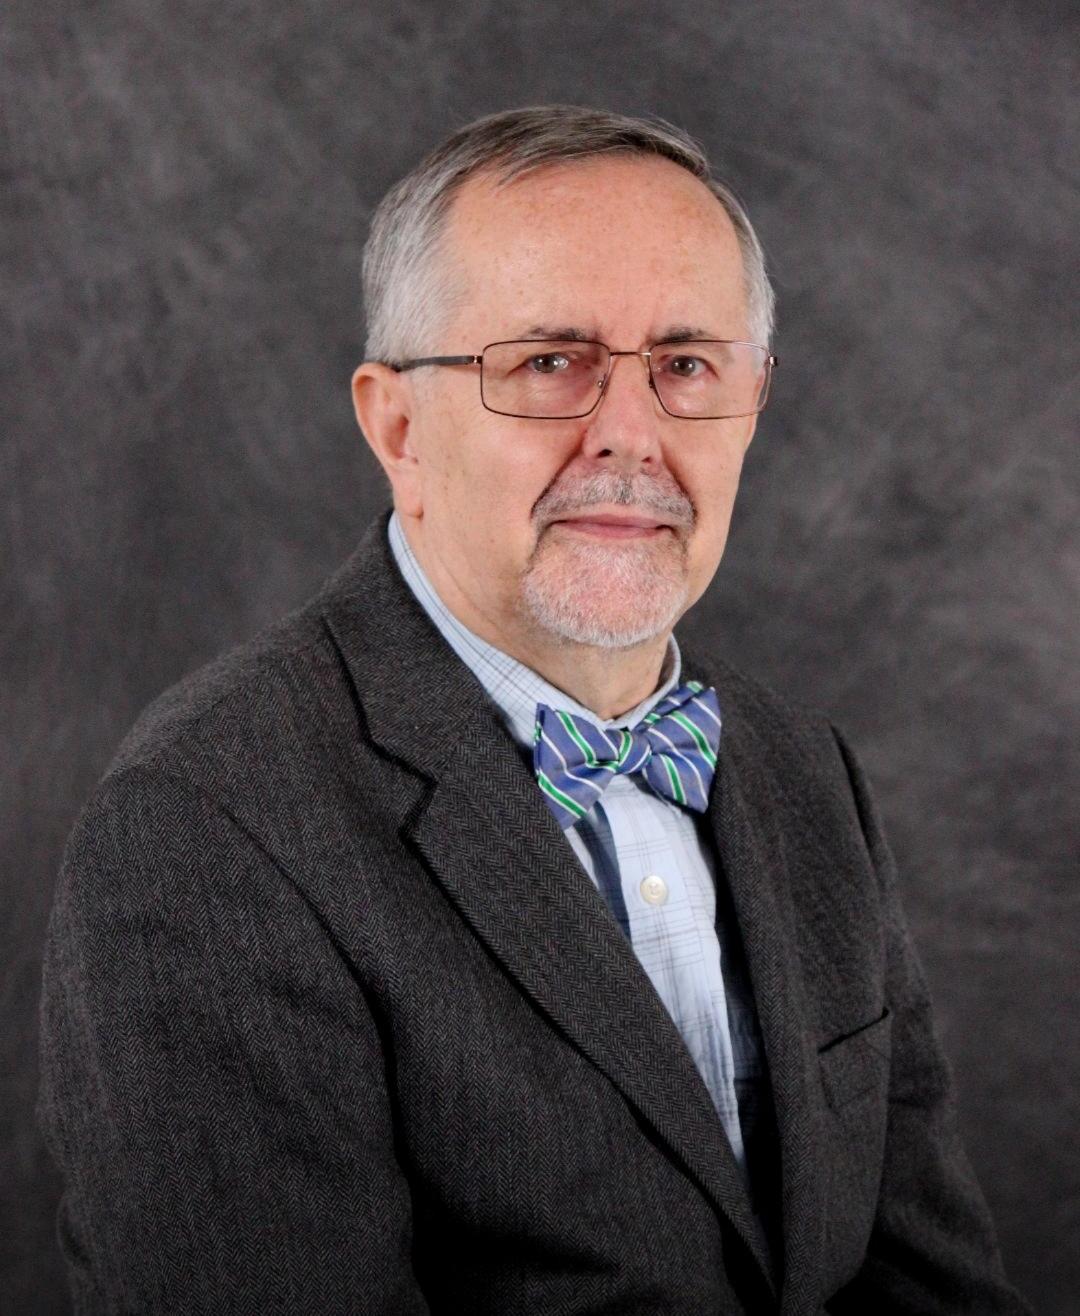 Dermatologist Mark Kaminski, M.D. Joins Southwest Medical Center Team